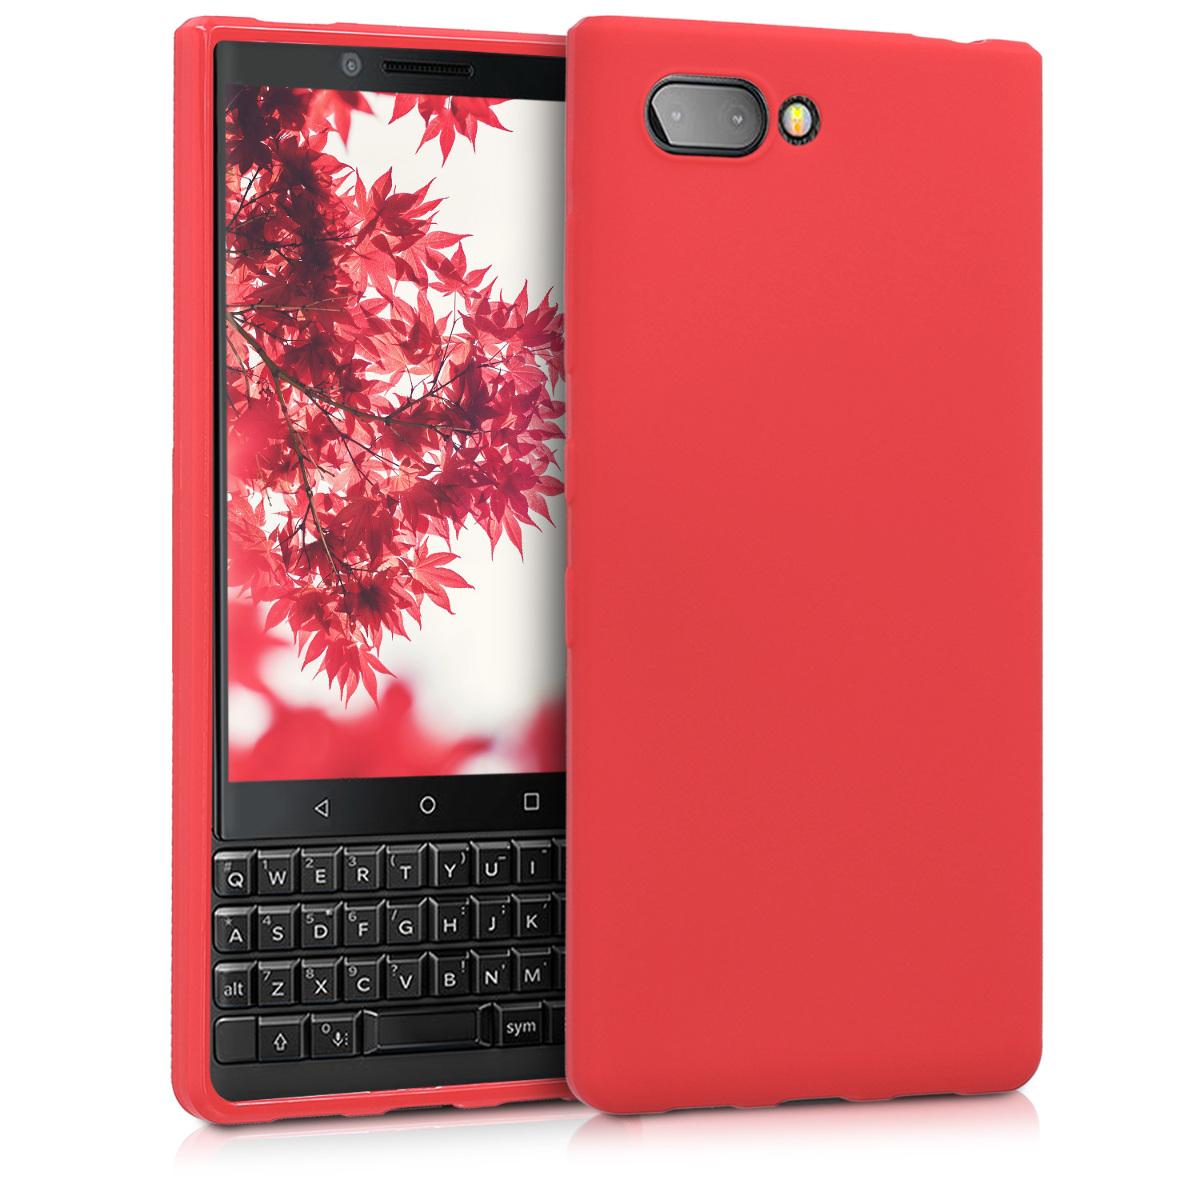 KW Θήκη Σιλικόνης Blackberry KEYtwo (Key2) - Red Matte (45435.51)